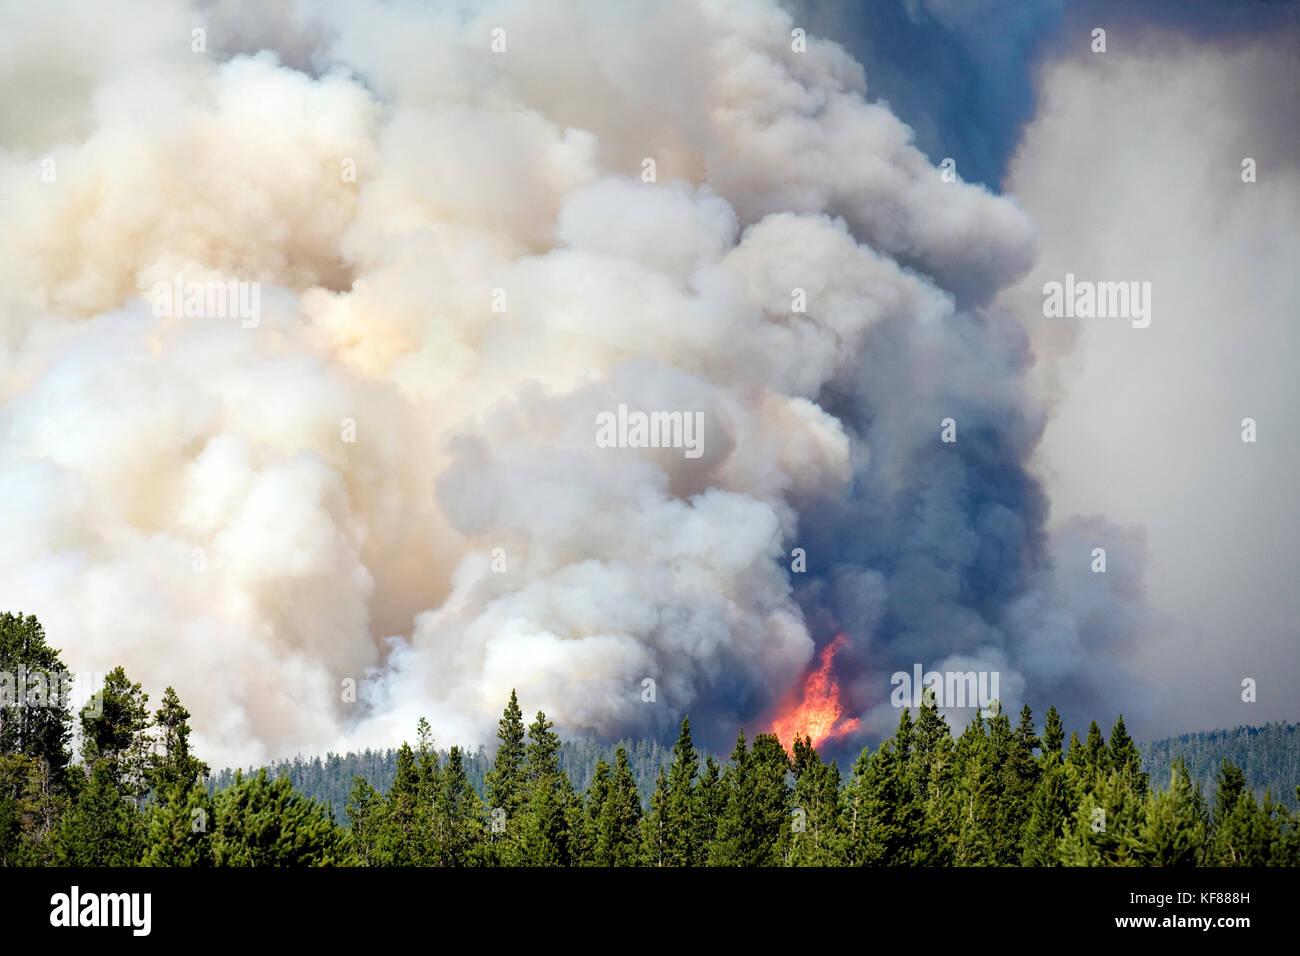 USA, Wyoming, forest fire, Fishing Bridge, Yellowstone National Park - Stock Image